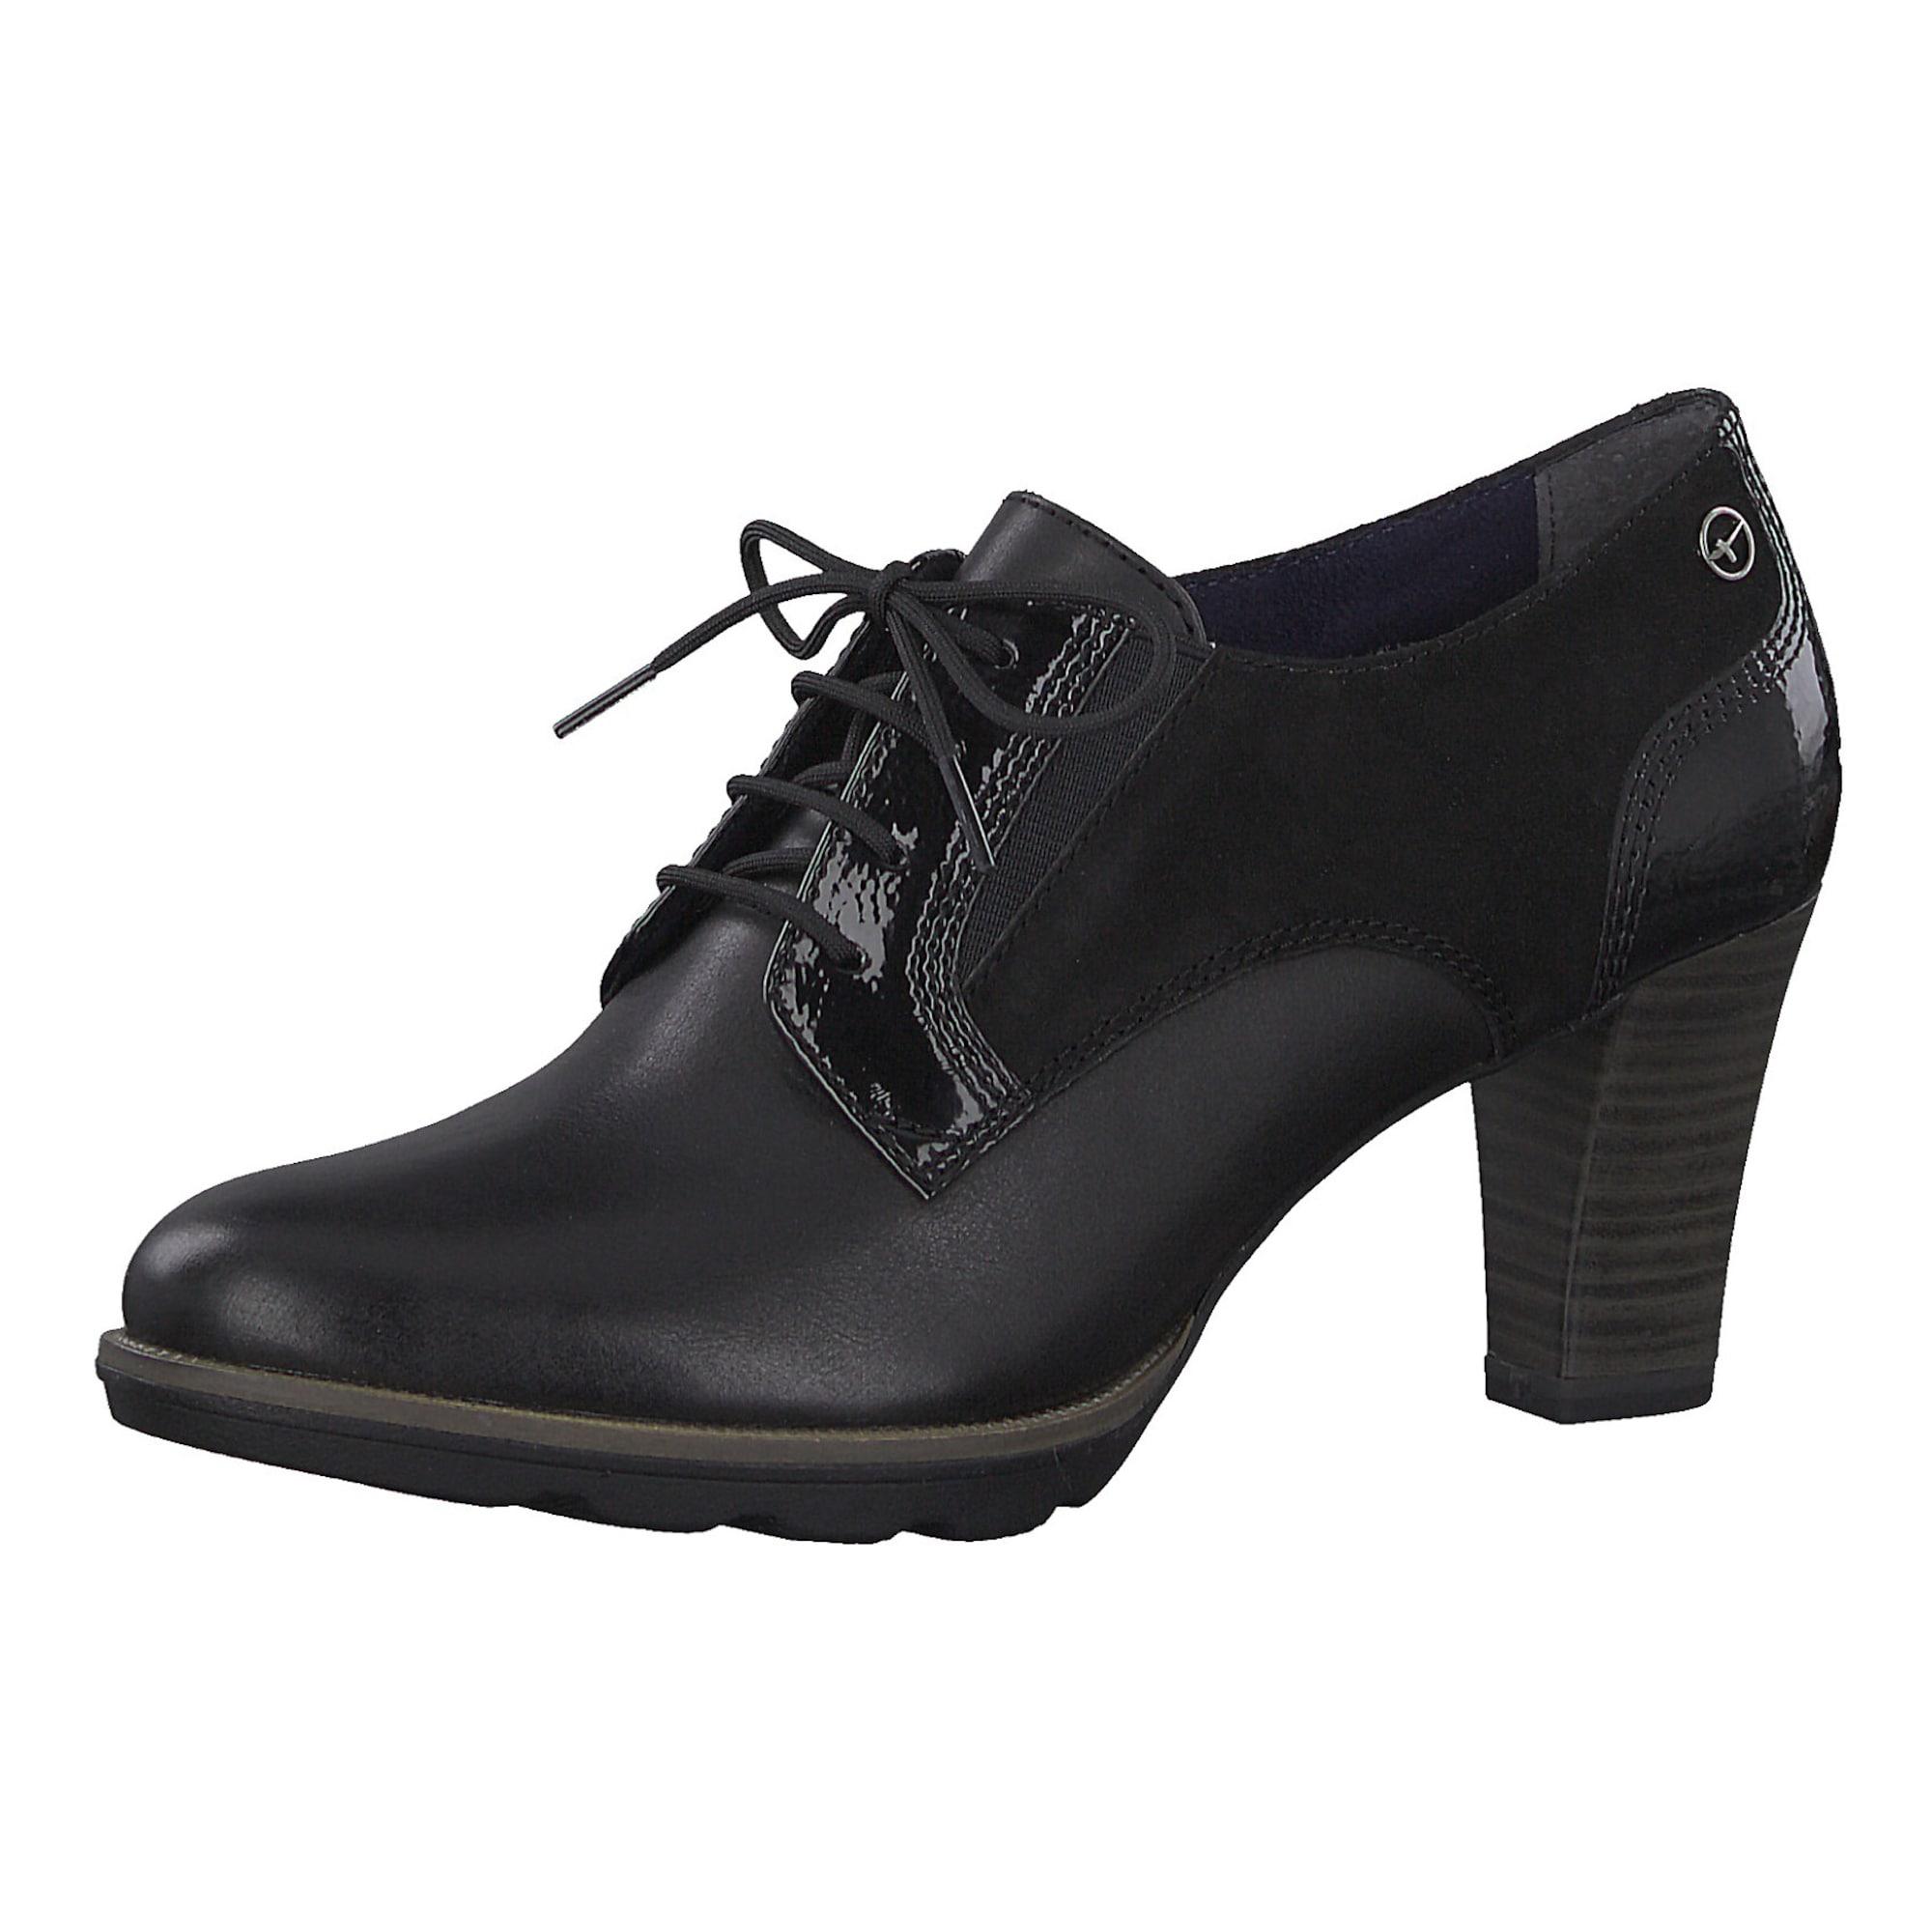 Halbschuhe 'Fee' | Schuhe > Boots | tamaris